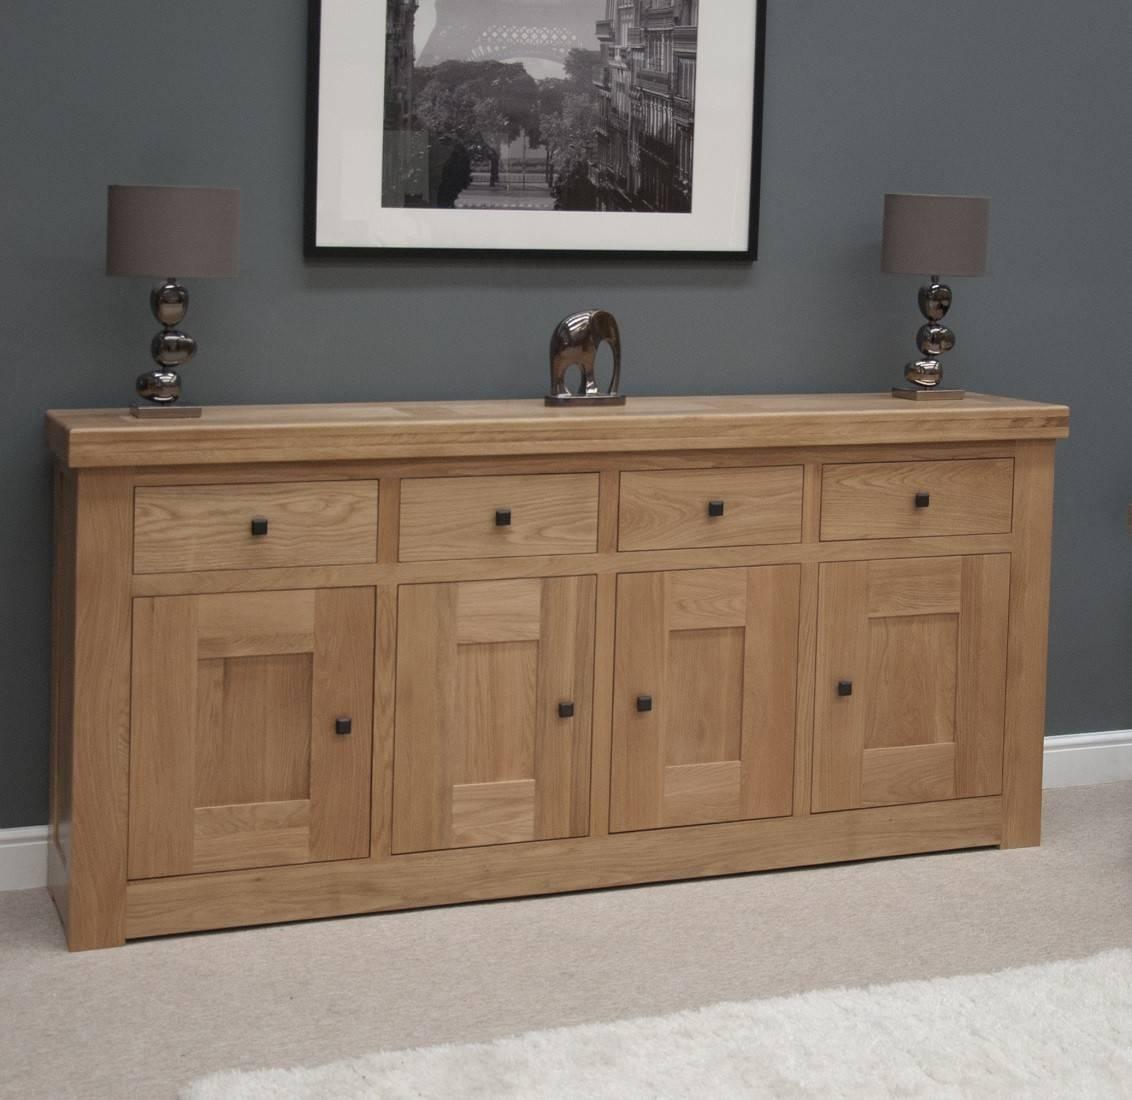 French Bordeaux Oak Extra Large 4 Door Sideboard | Oak Furniture Uk Pertaining To Sideboards Uk Sale (#8 of 20)